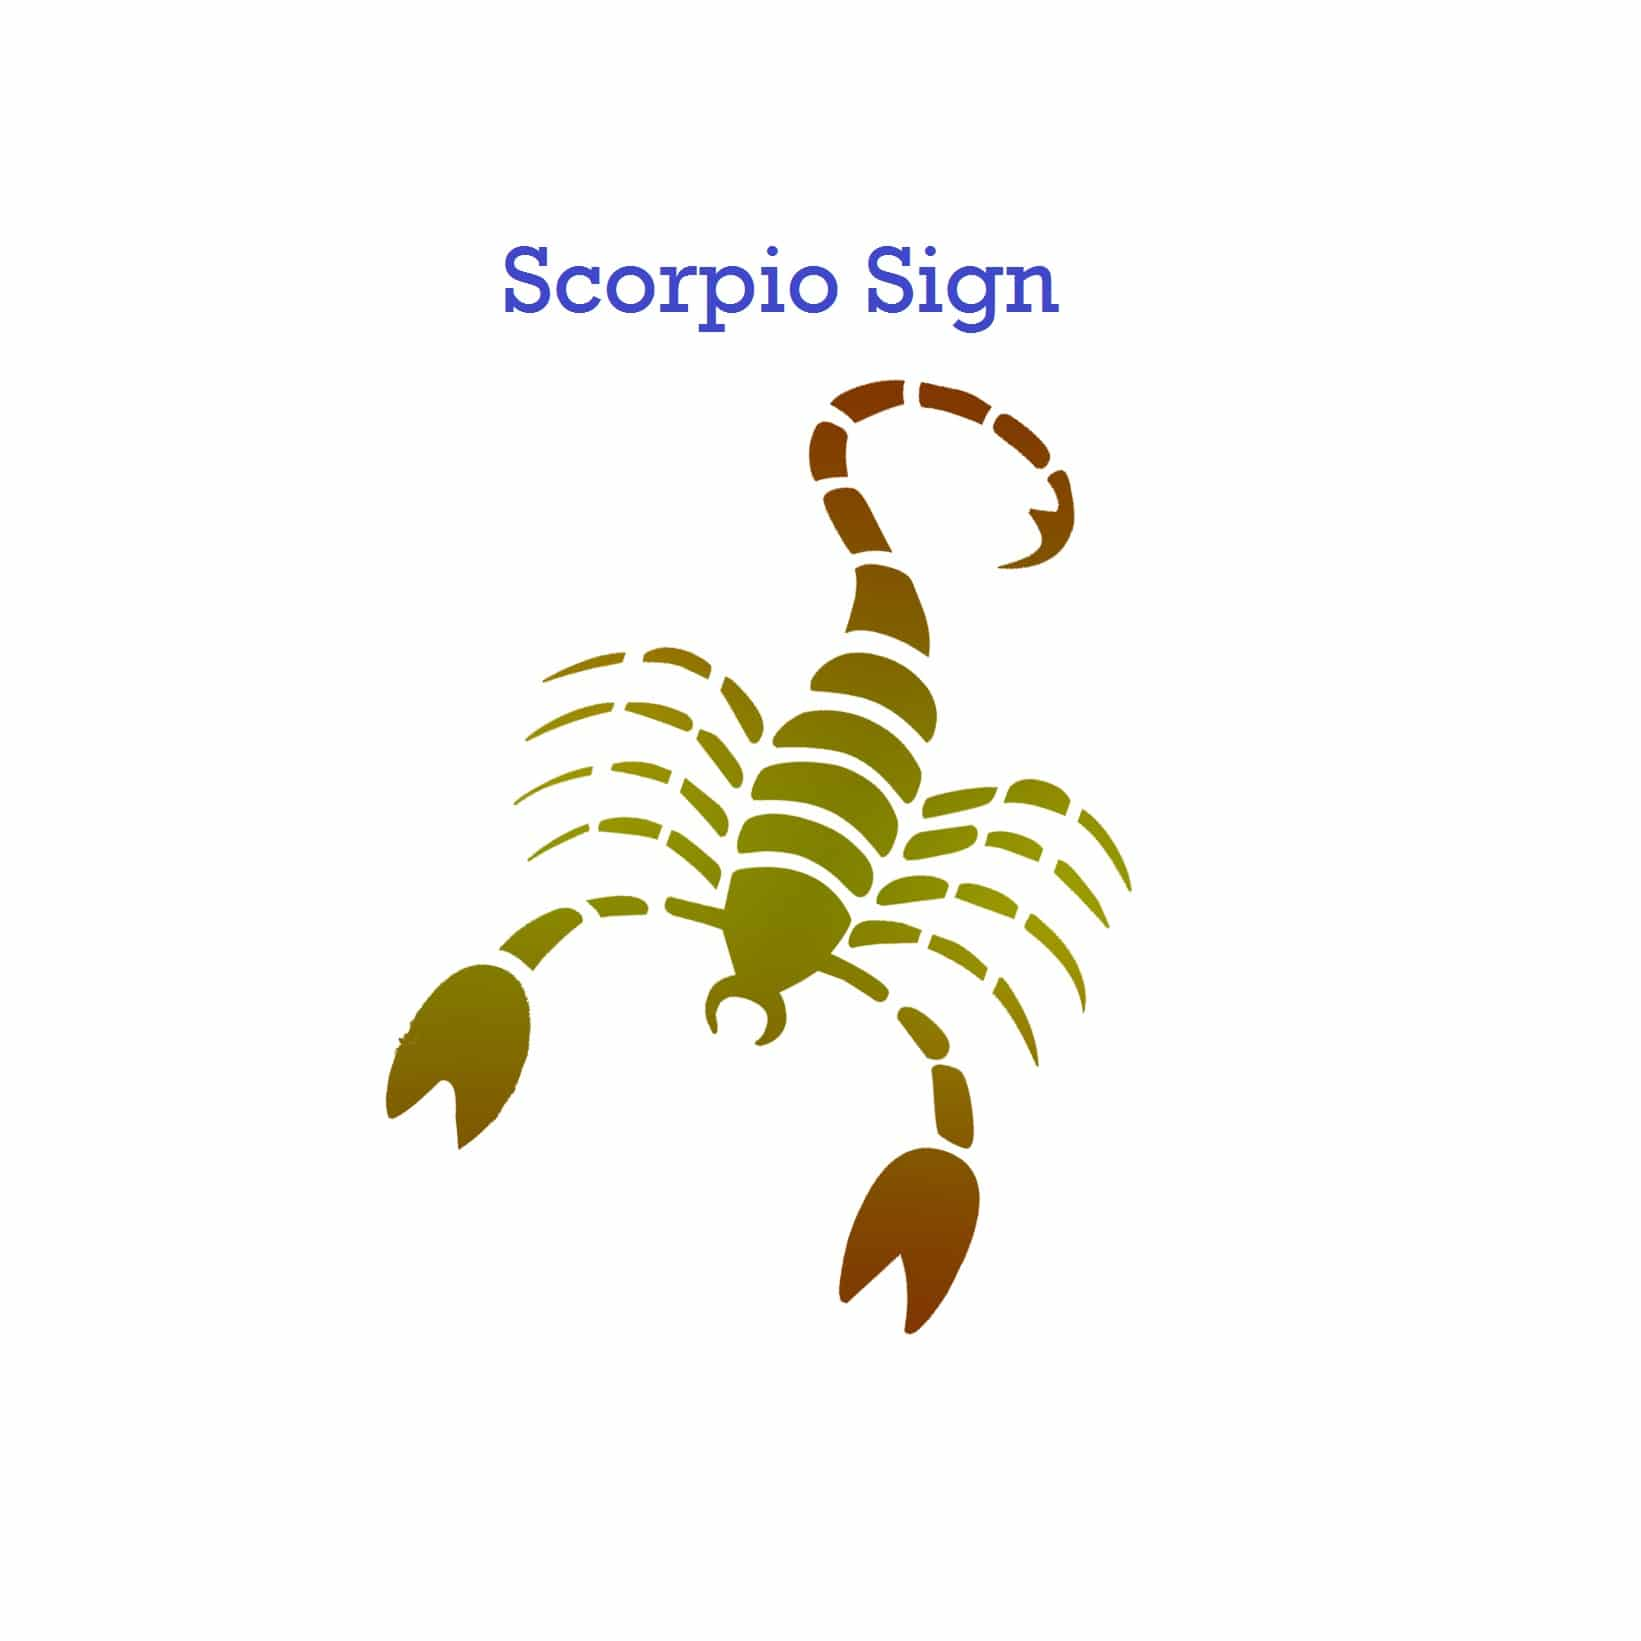 Scorpio Zodiac Sign General Characteristic and Significance